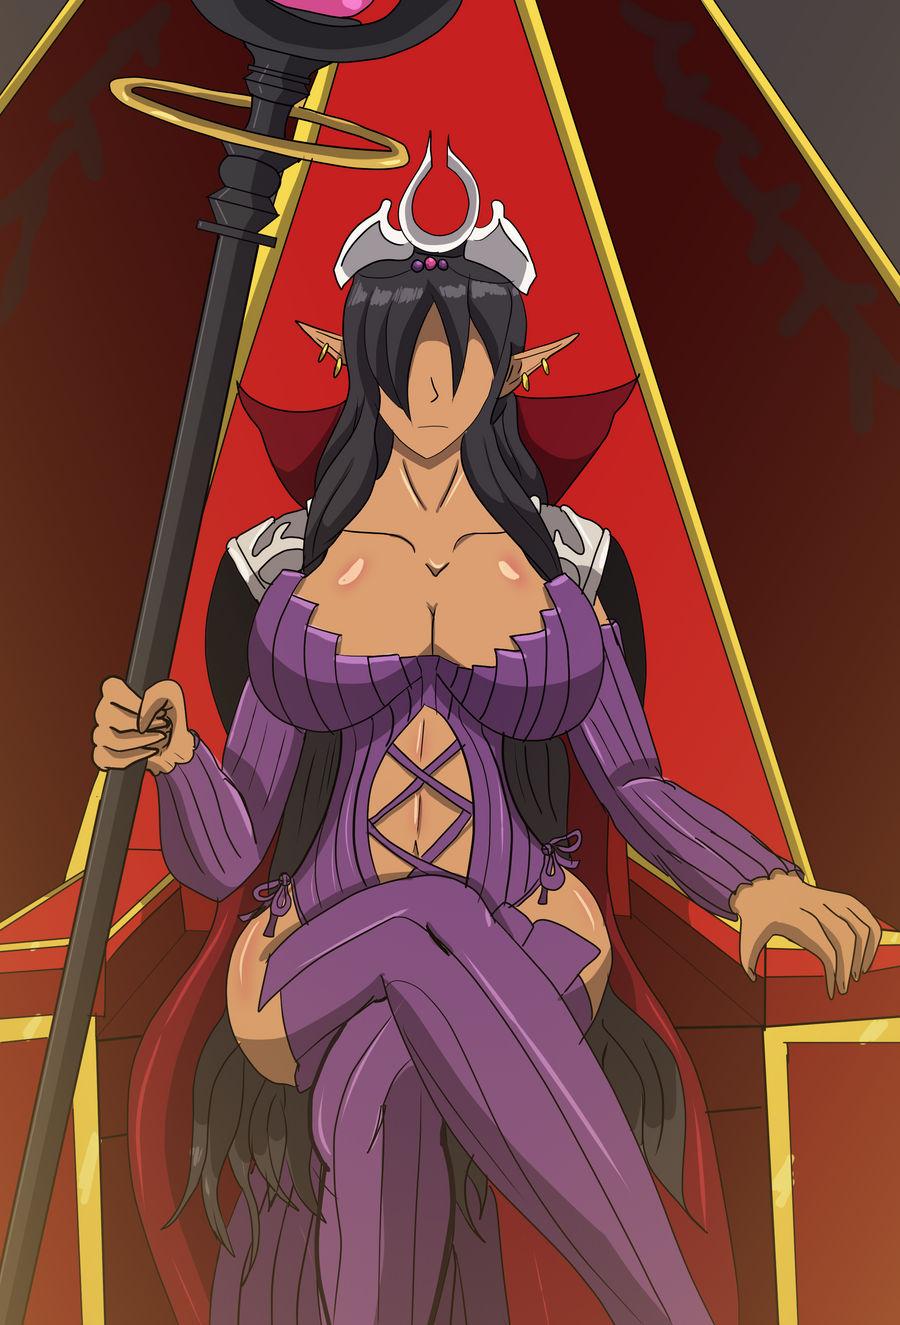 Kuroinu Rebellion: The Dark Queen